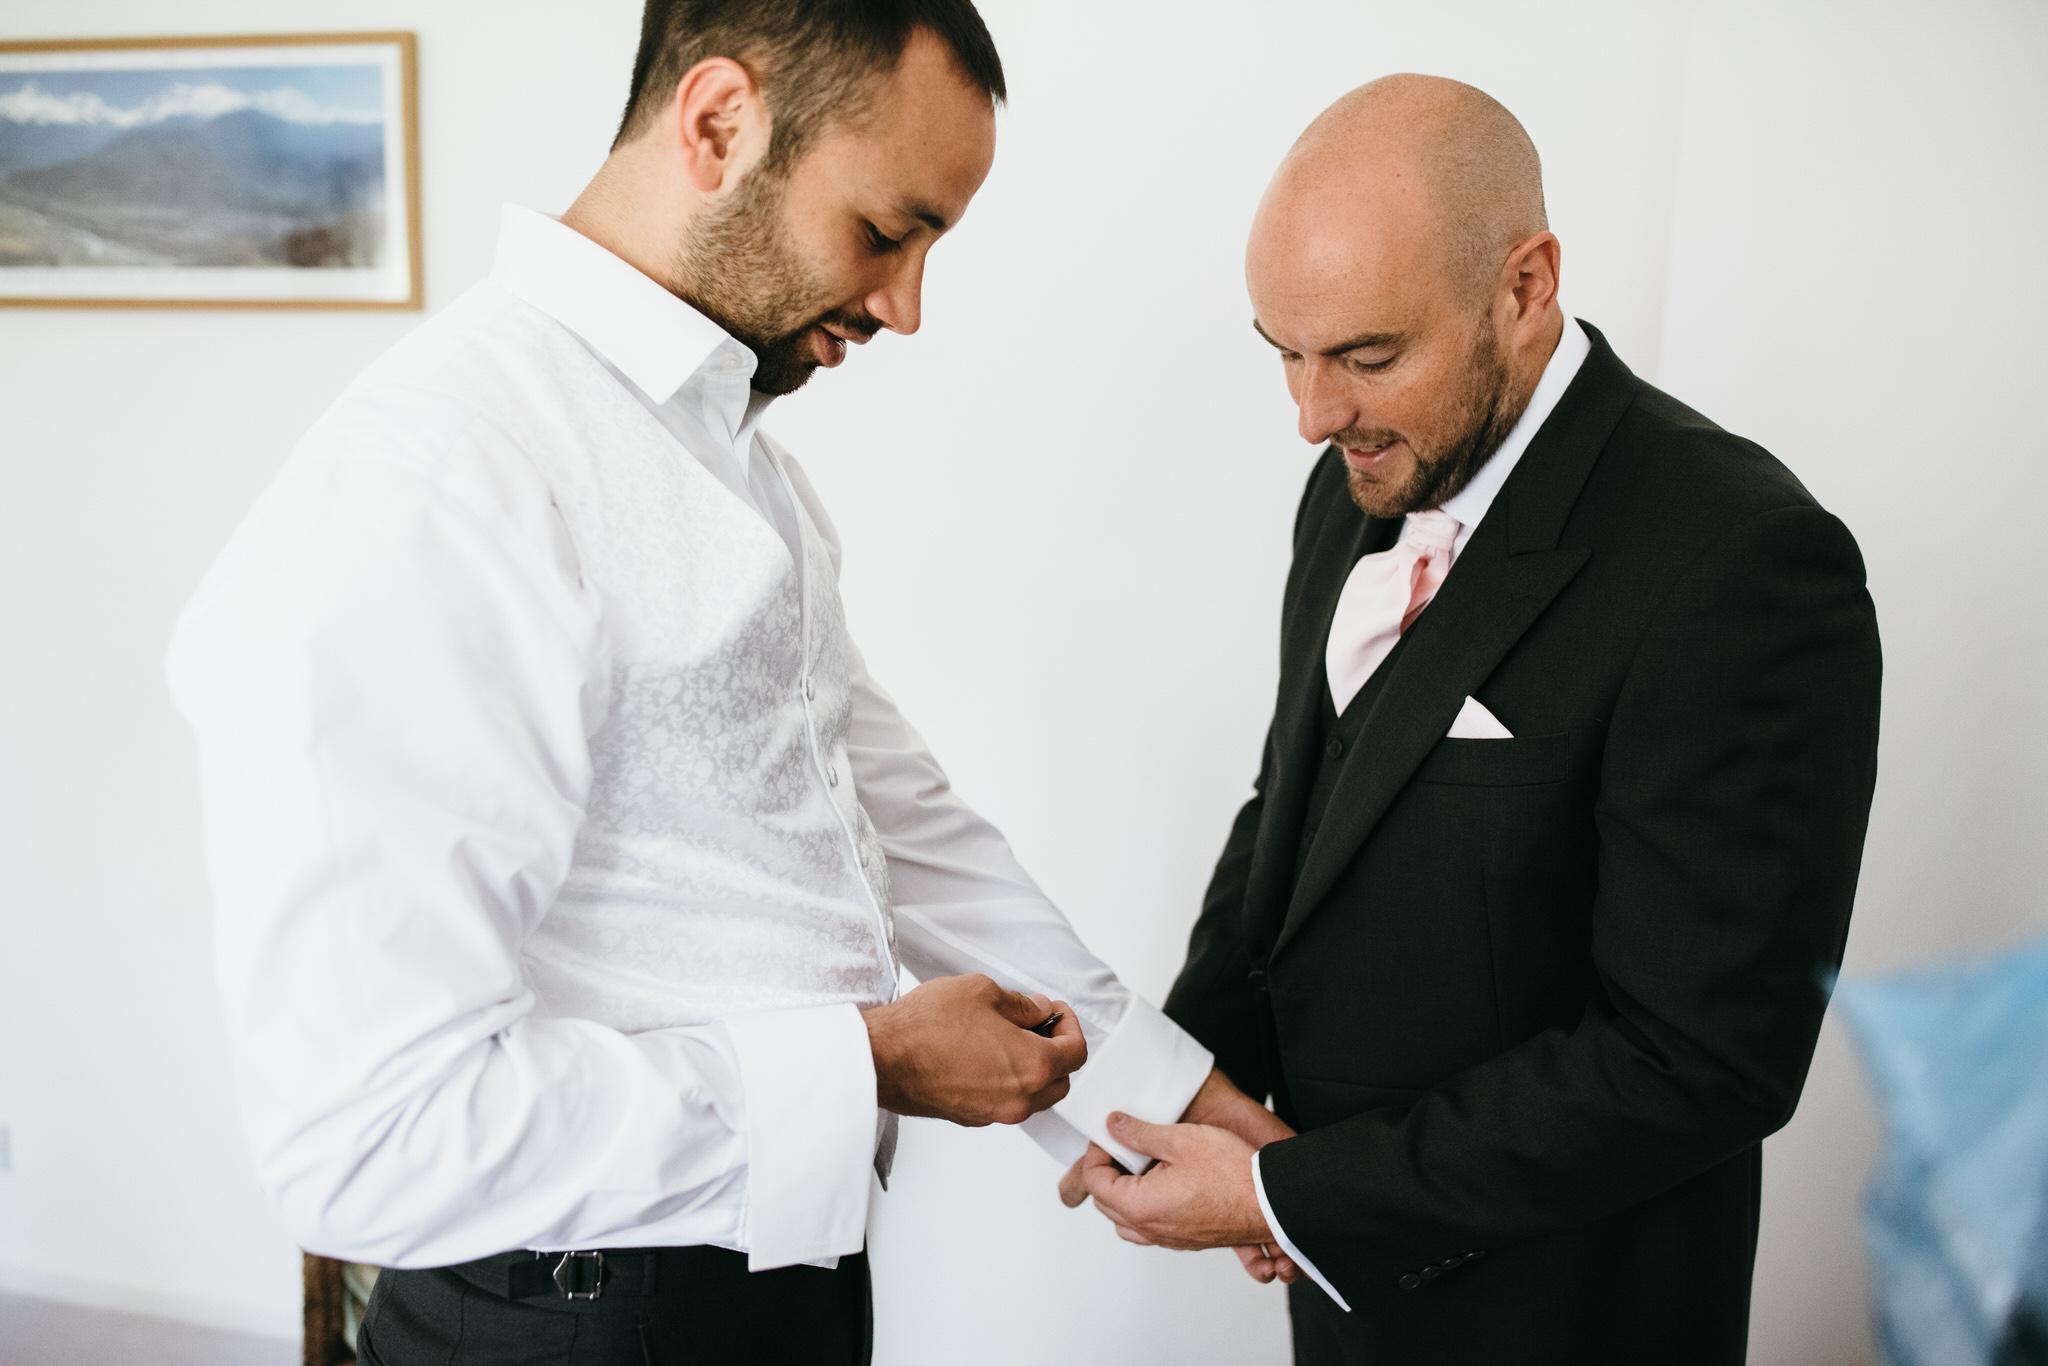 Groom and usher put wedding cufflinks on